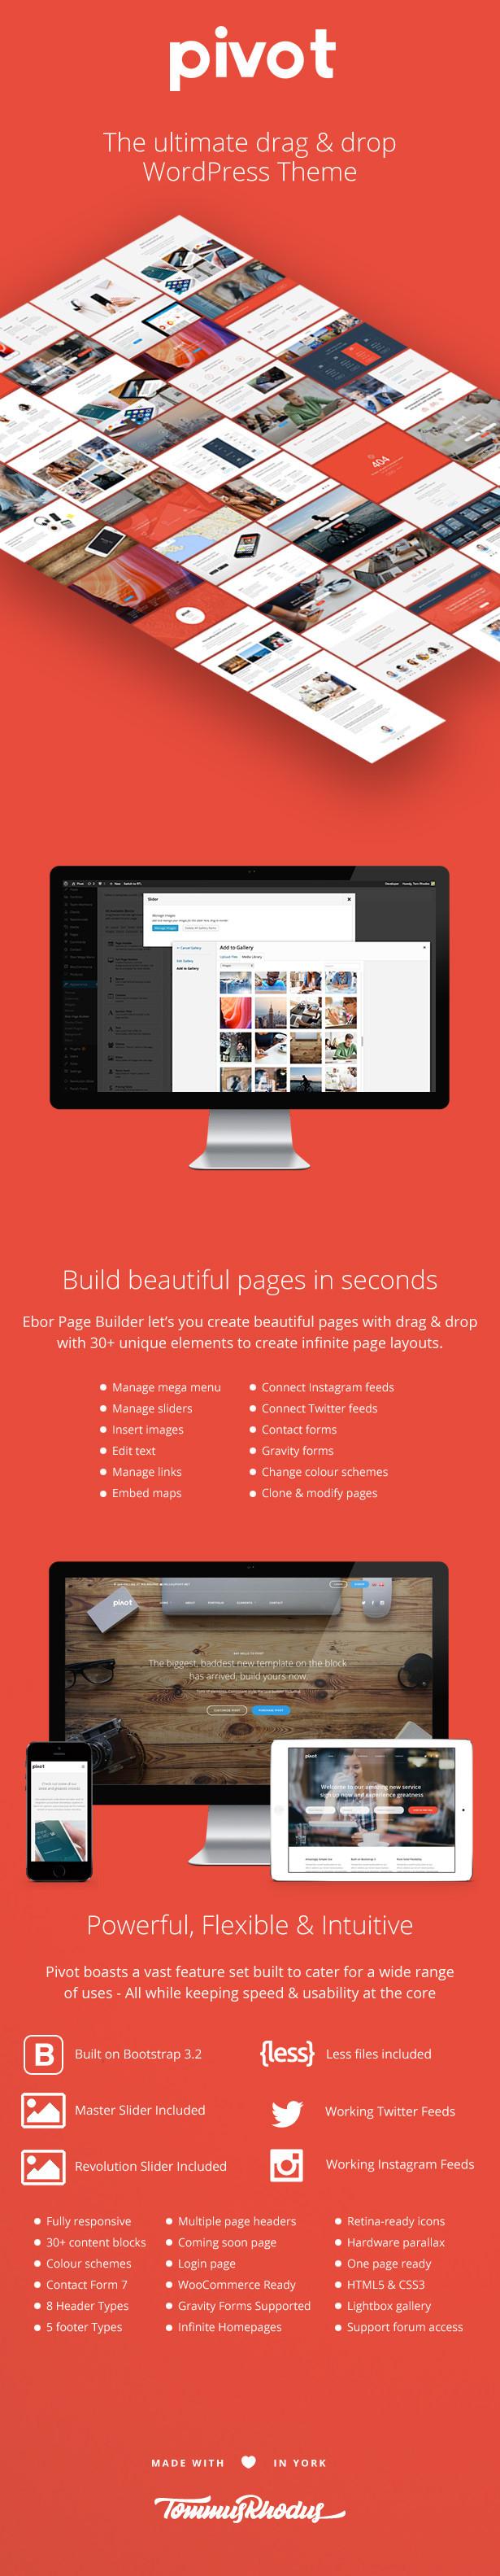 pivot 4 - Pivot   Responsive Multipurpose WordPress Theme